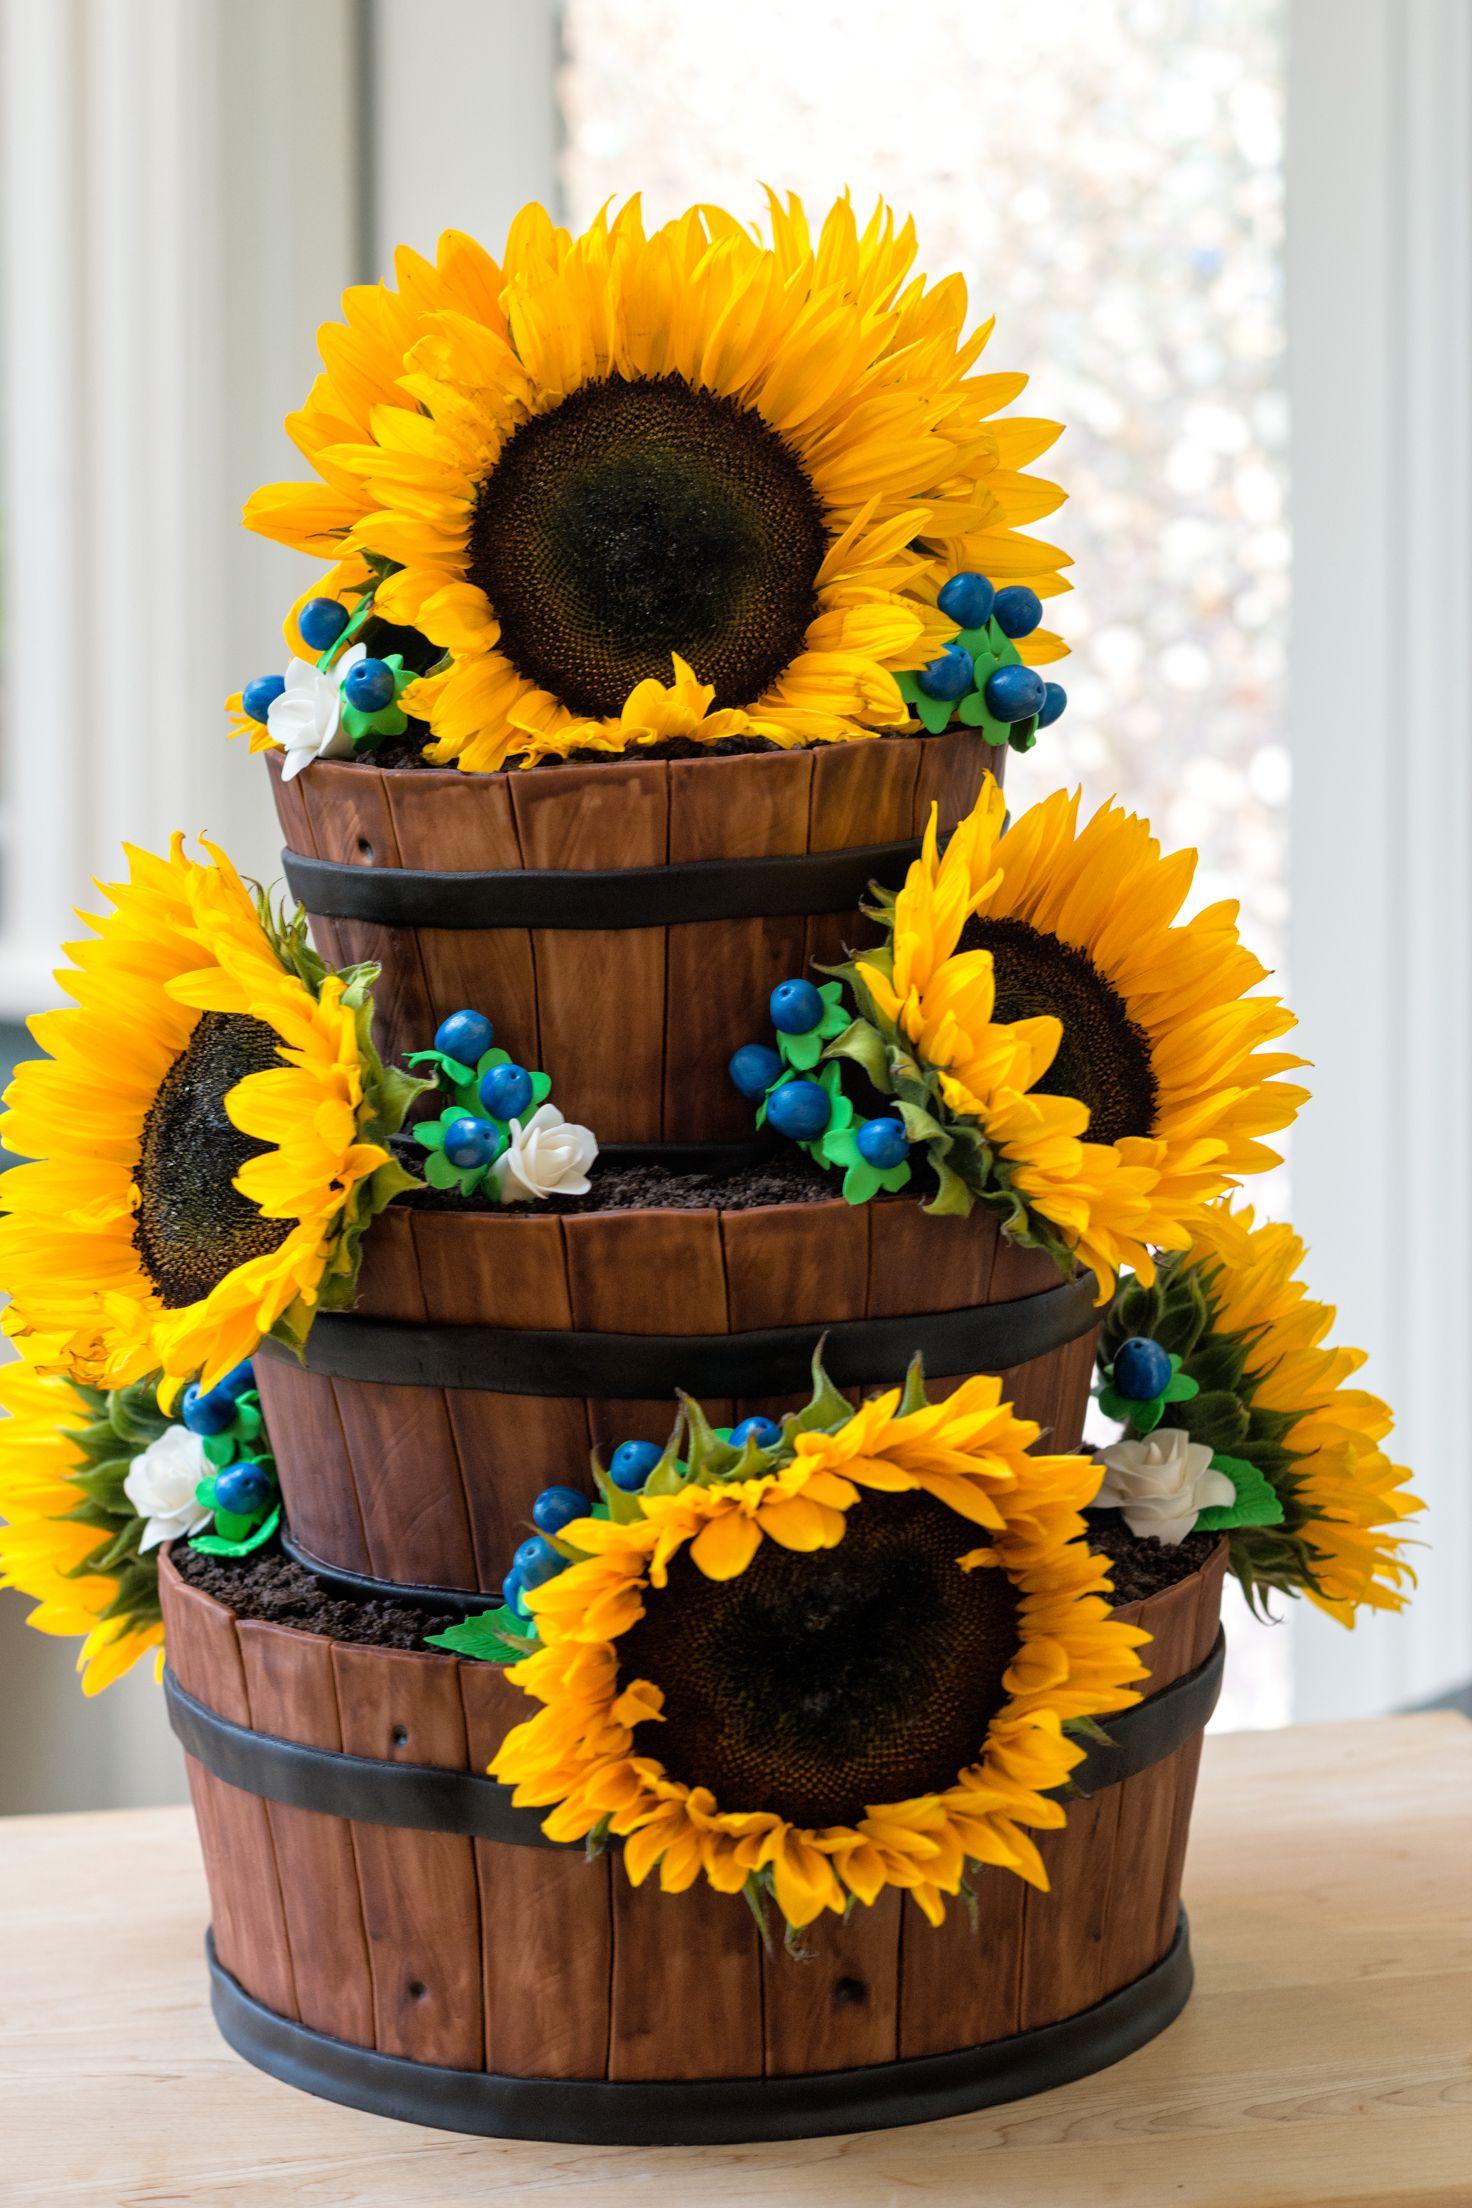 Sunflower blue berry white rose barrel wedding cake